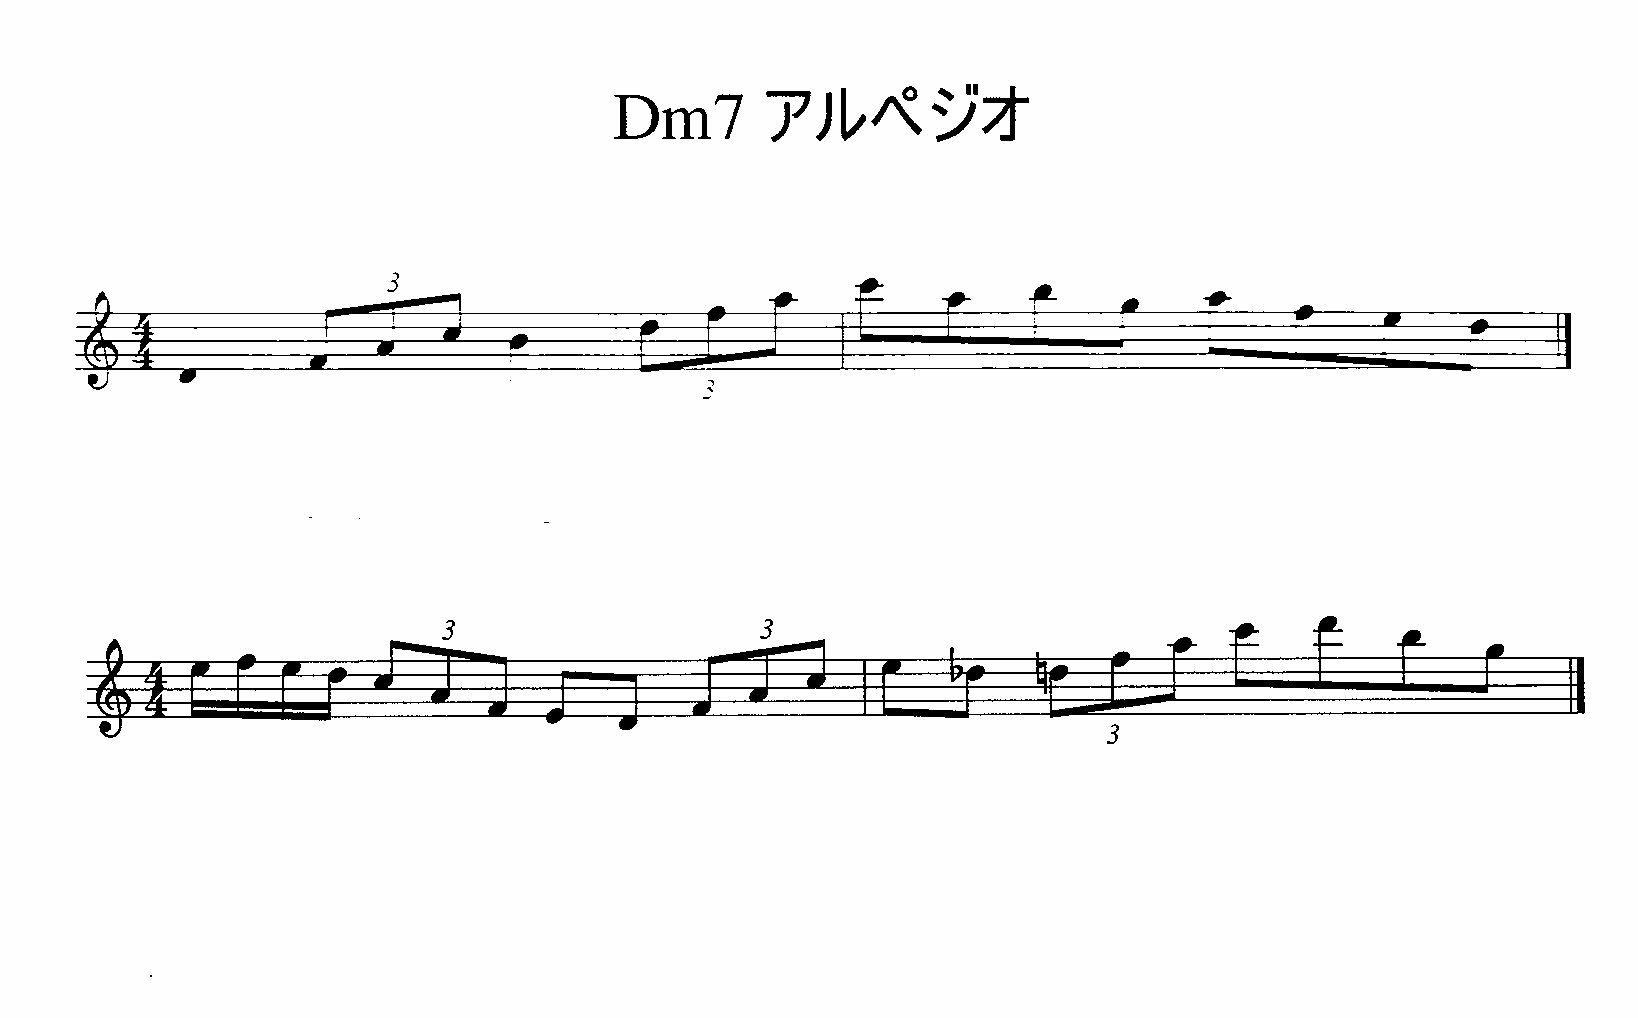 nori_000023.jpg